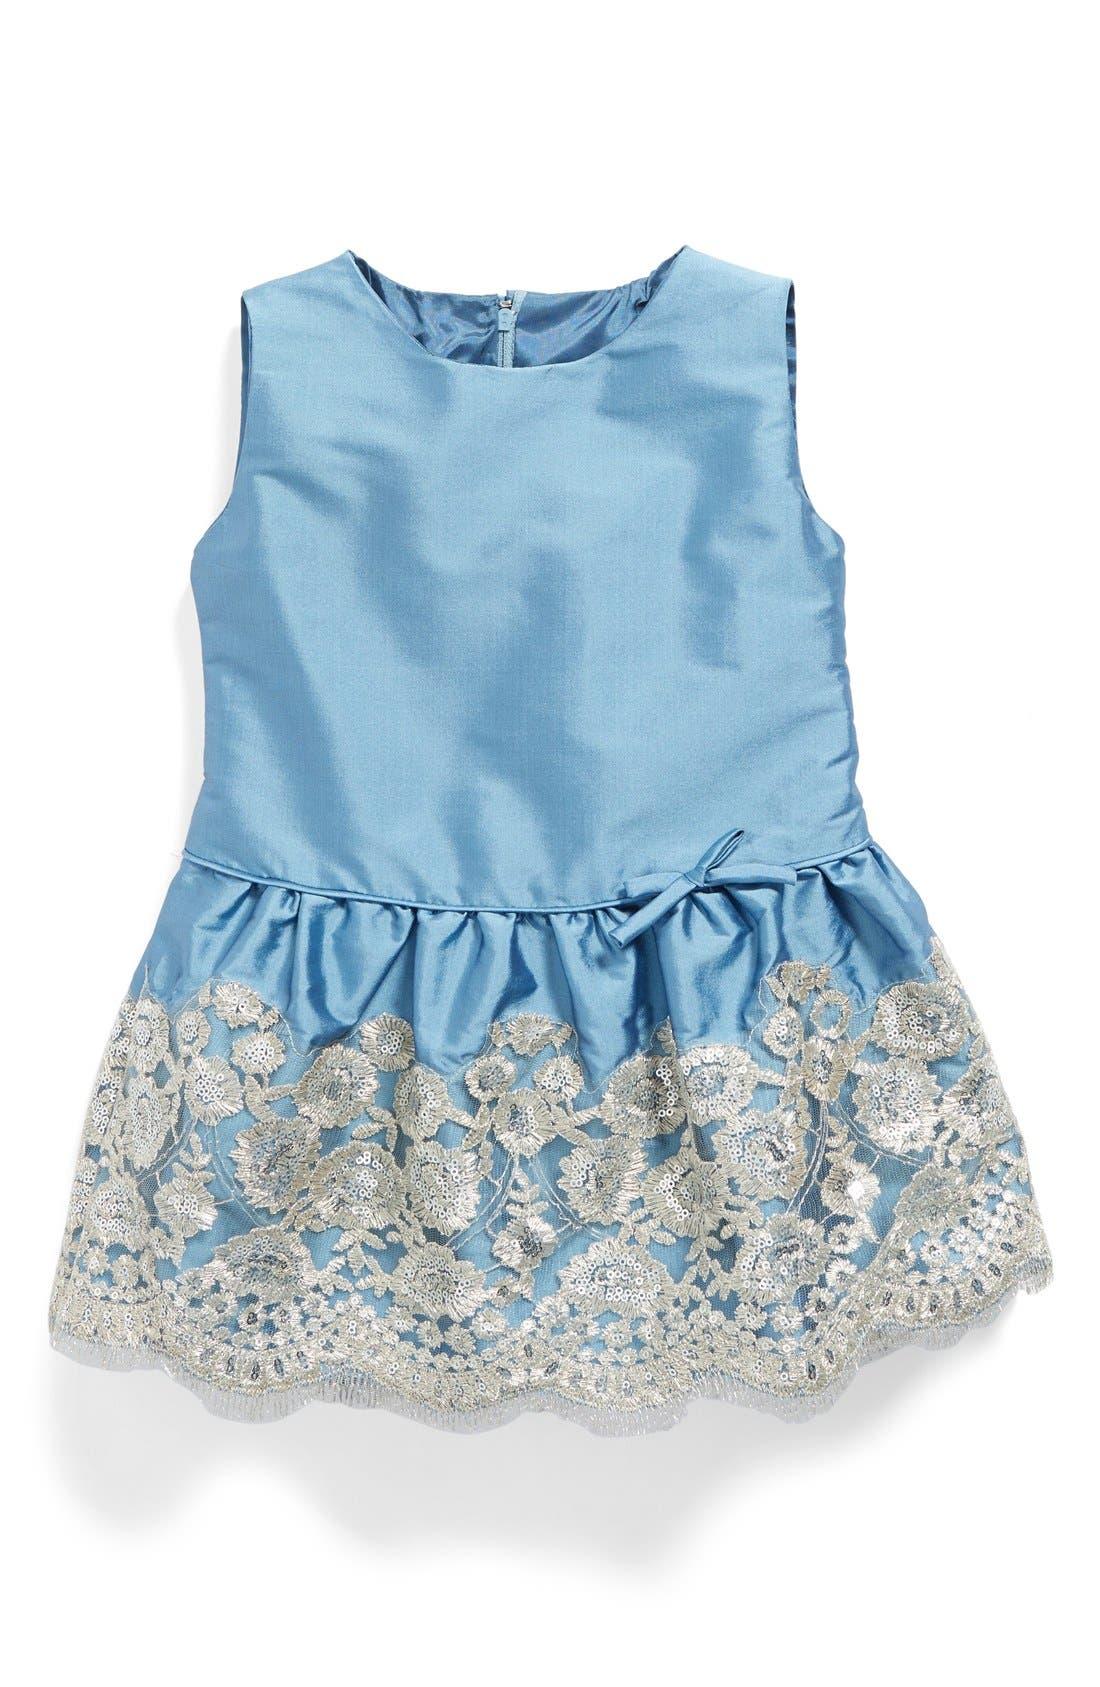 Isabel GarretonDrop Waist Dress (Toddler Girls, Little Girls & Big Girls)